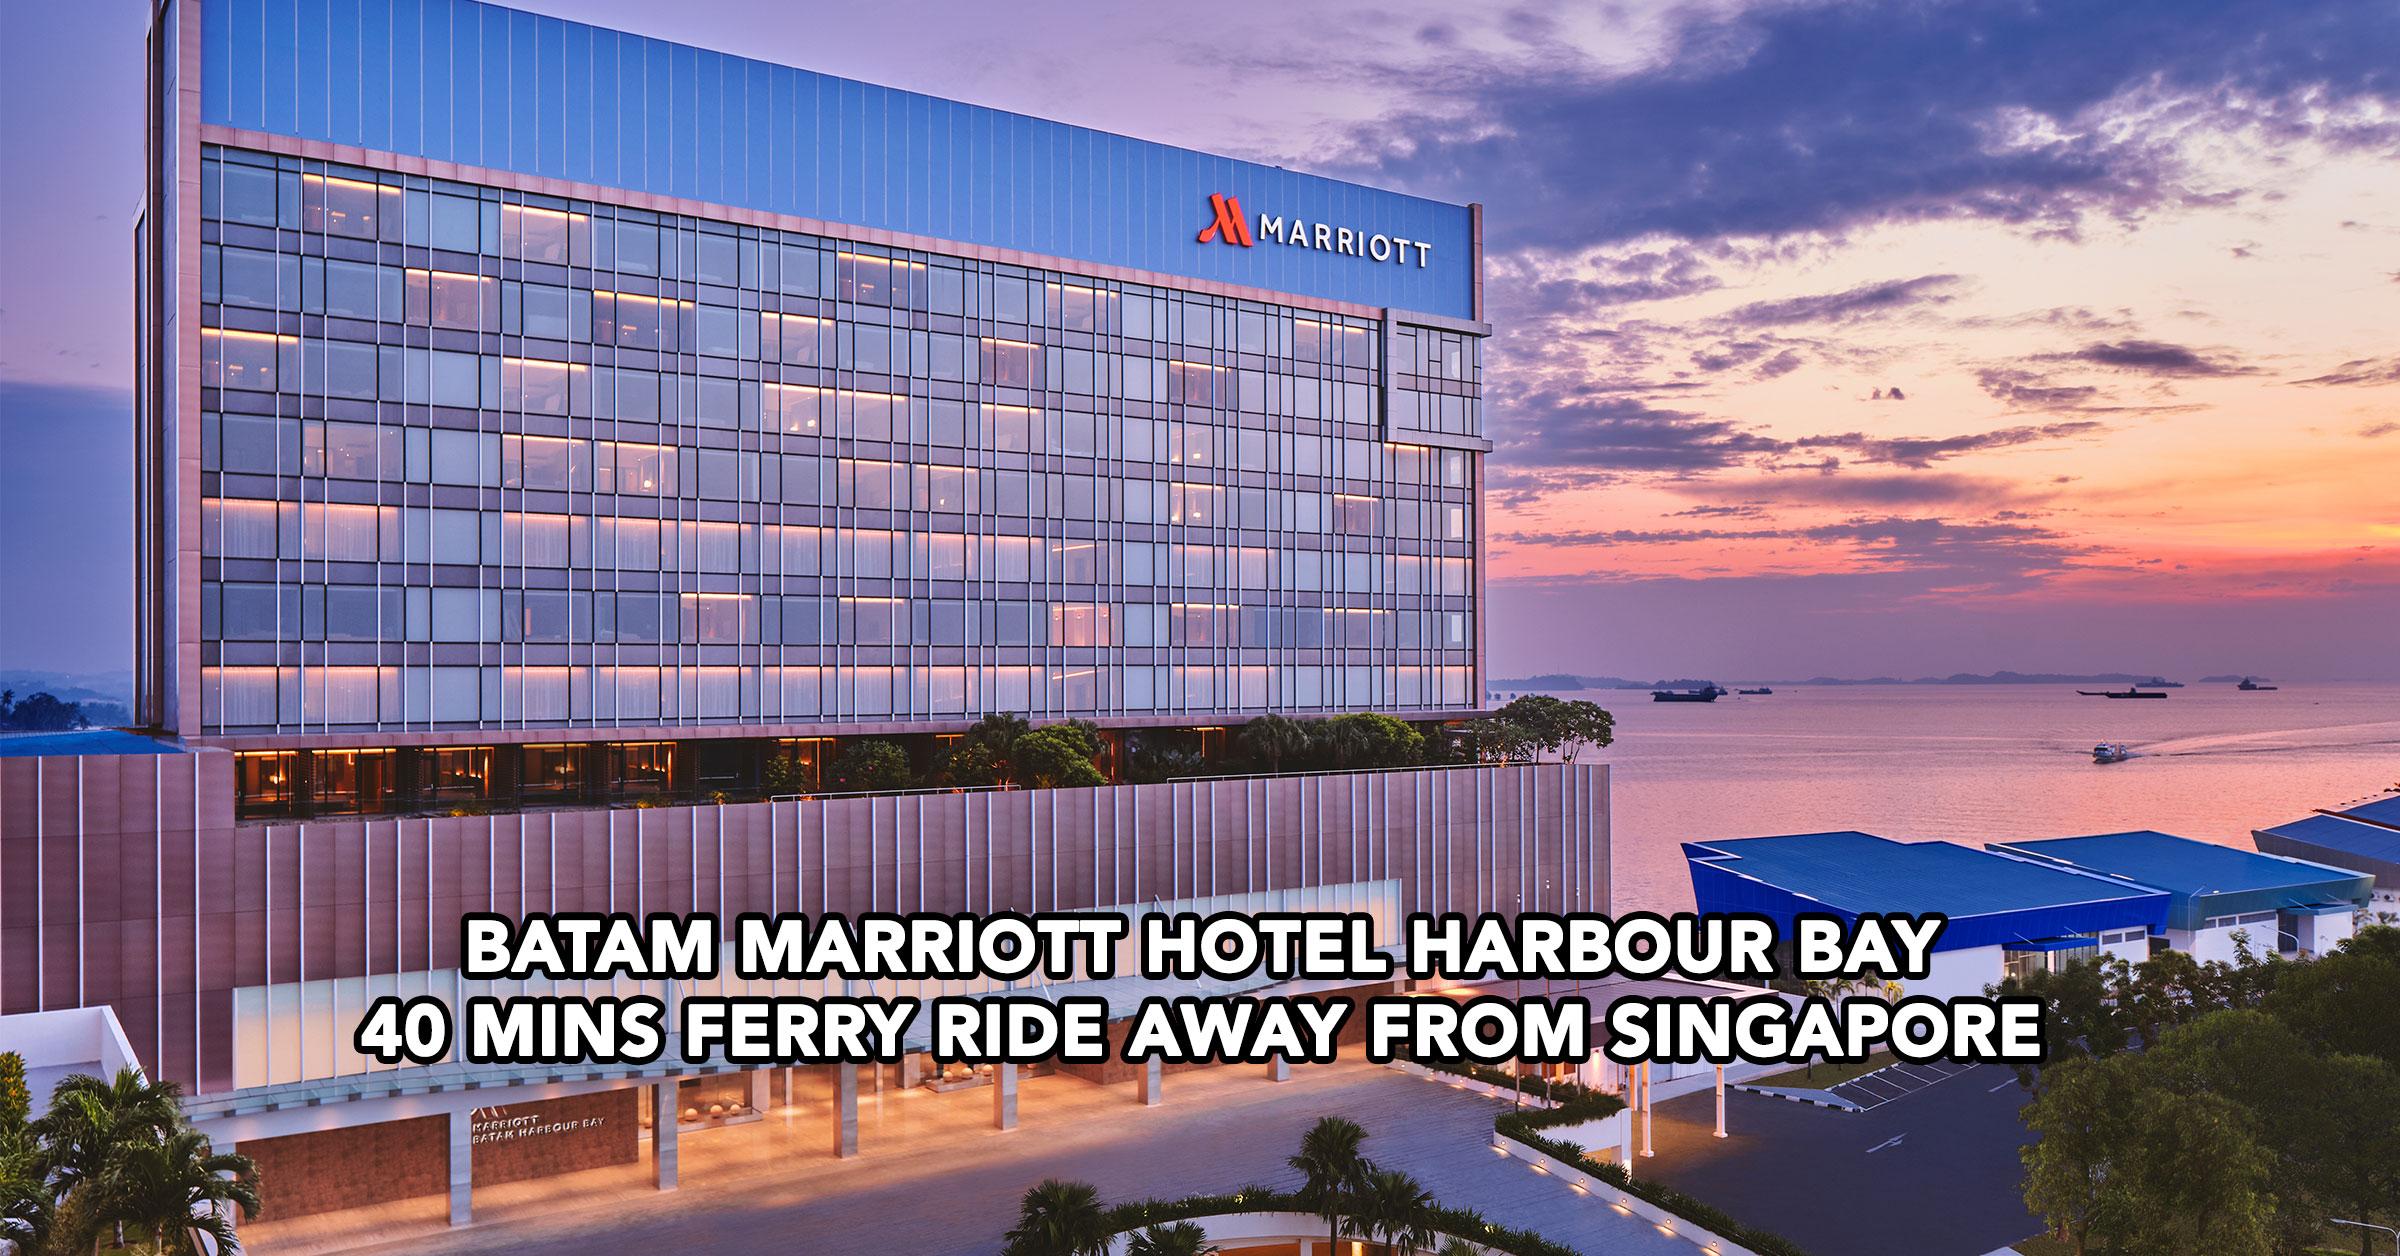 batam-marriott-hotel-harbour-bay-featured